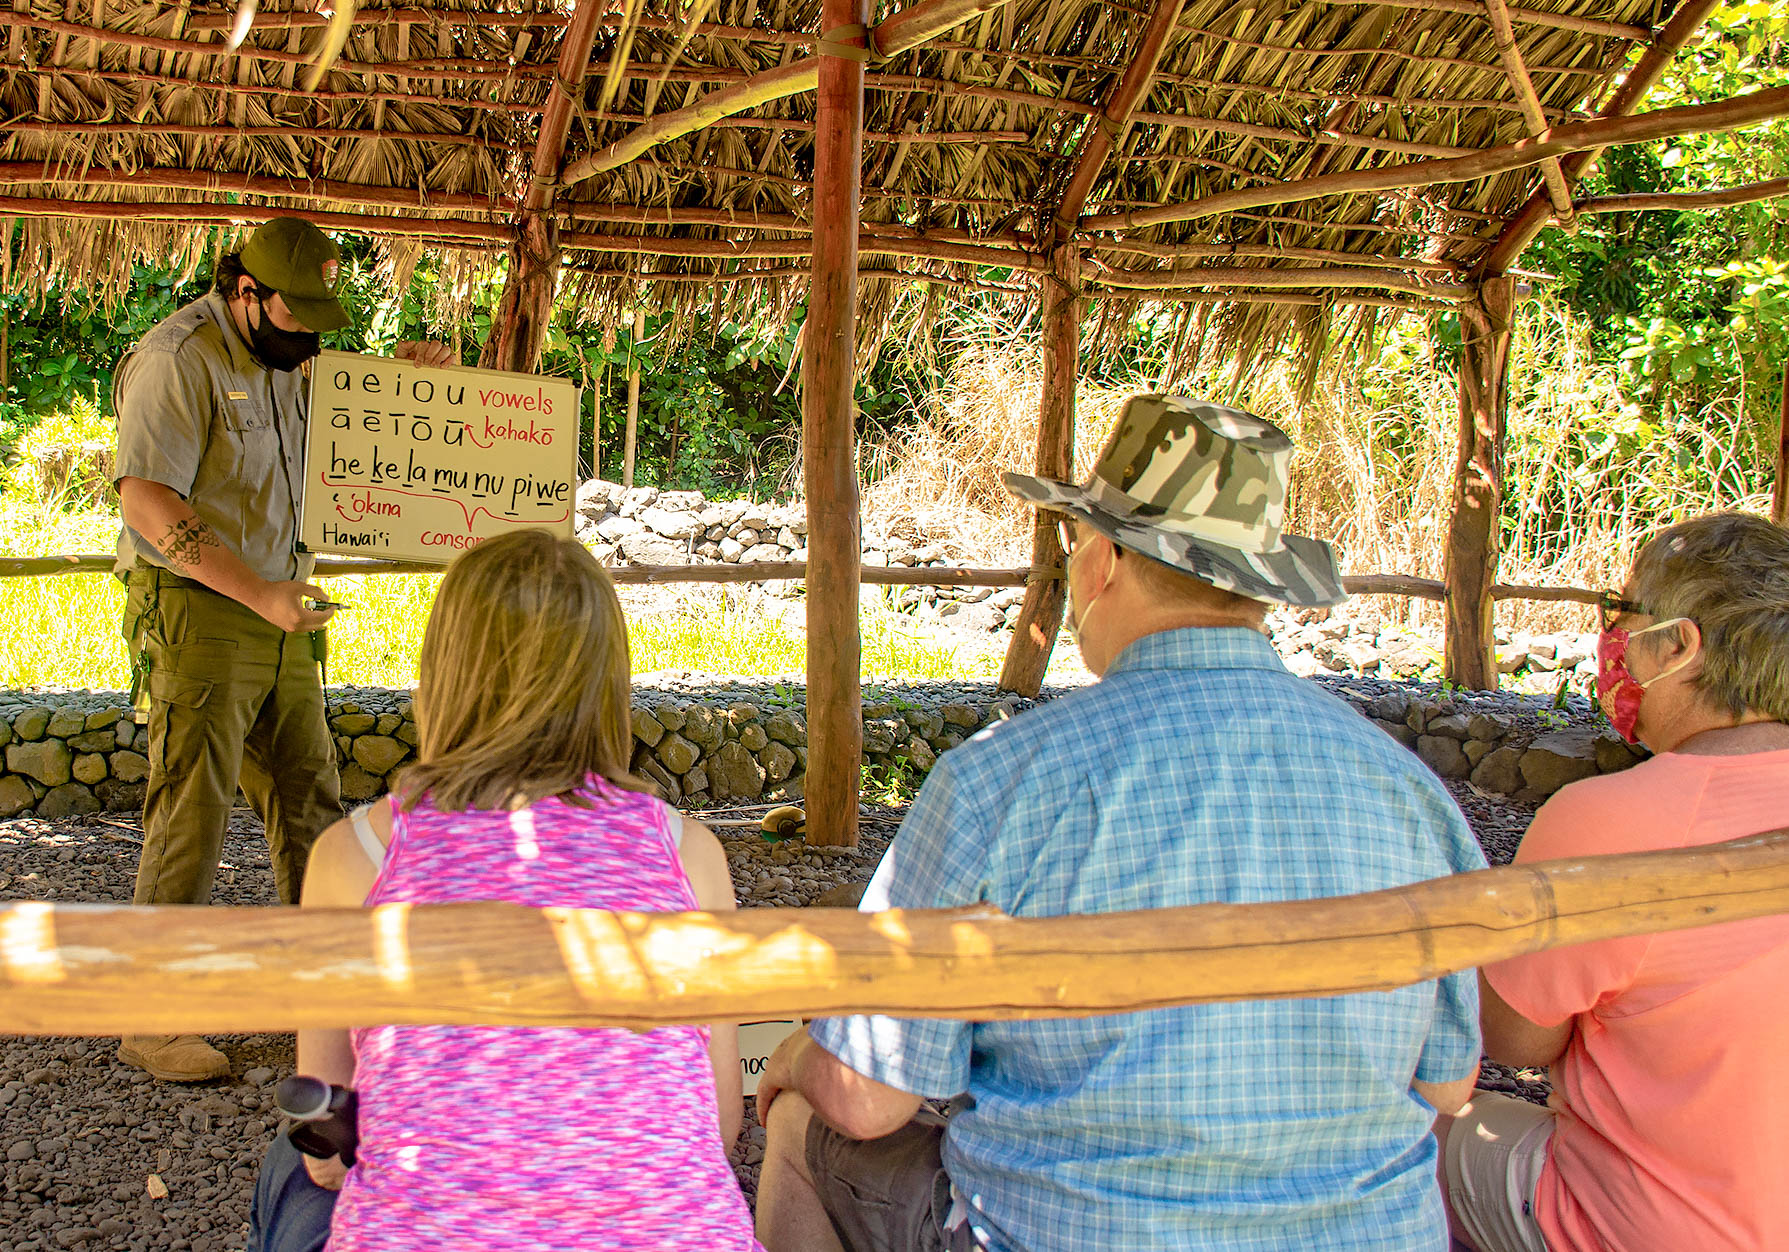 Haleakalā National Park Celebrates National Park Week April 17-25